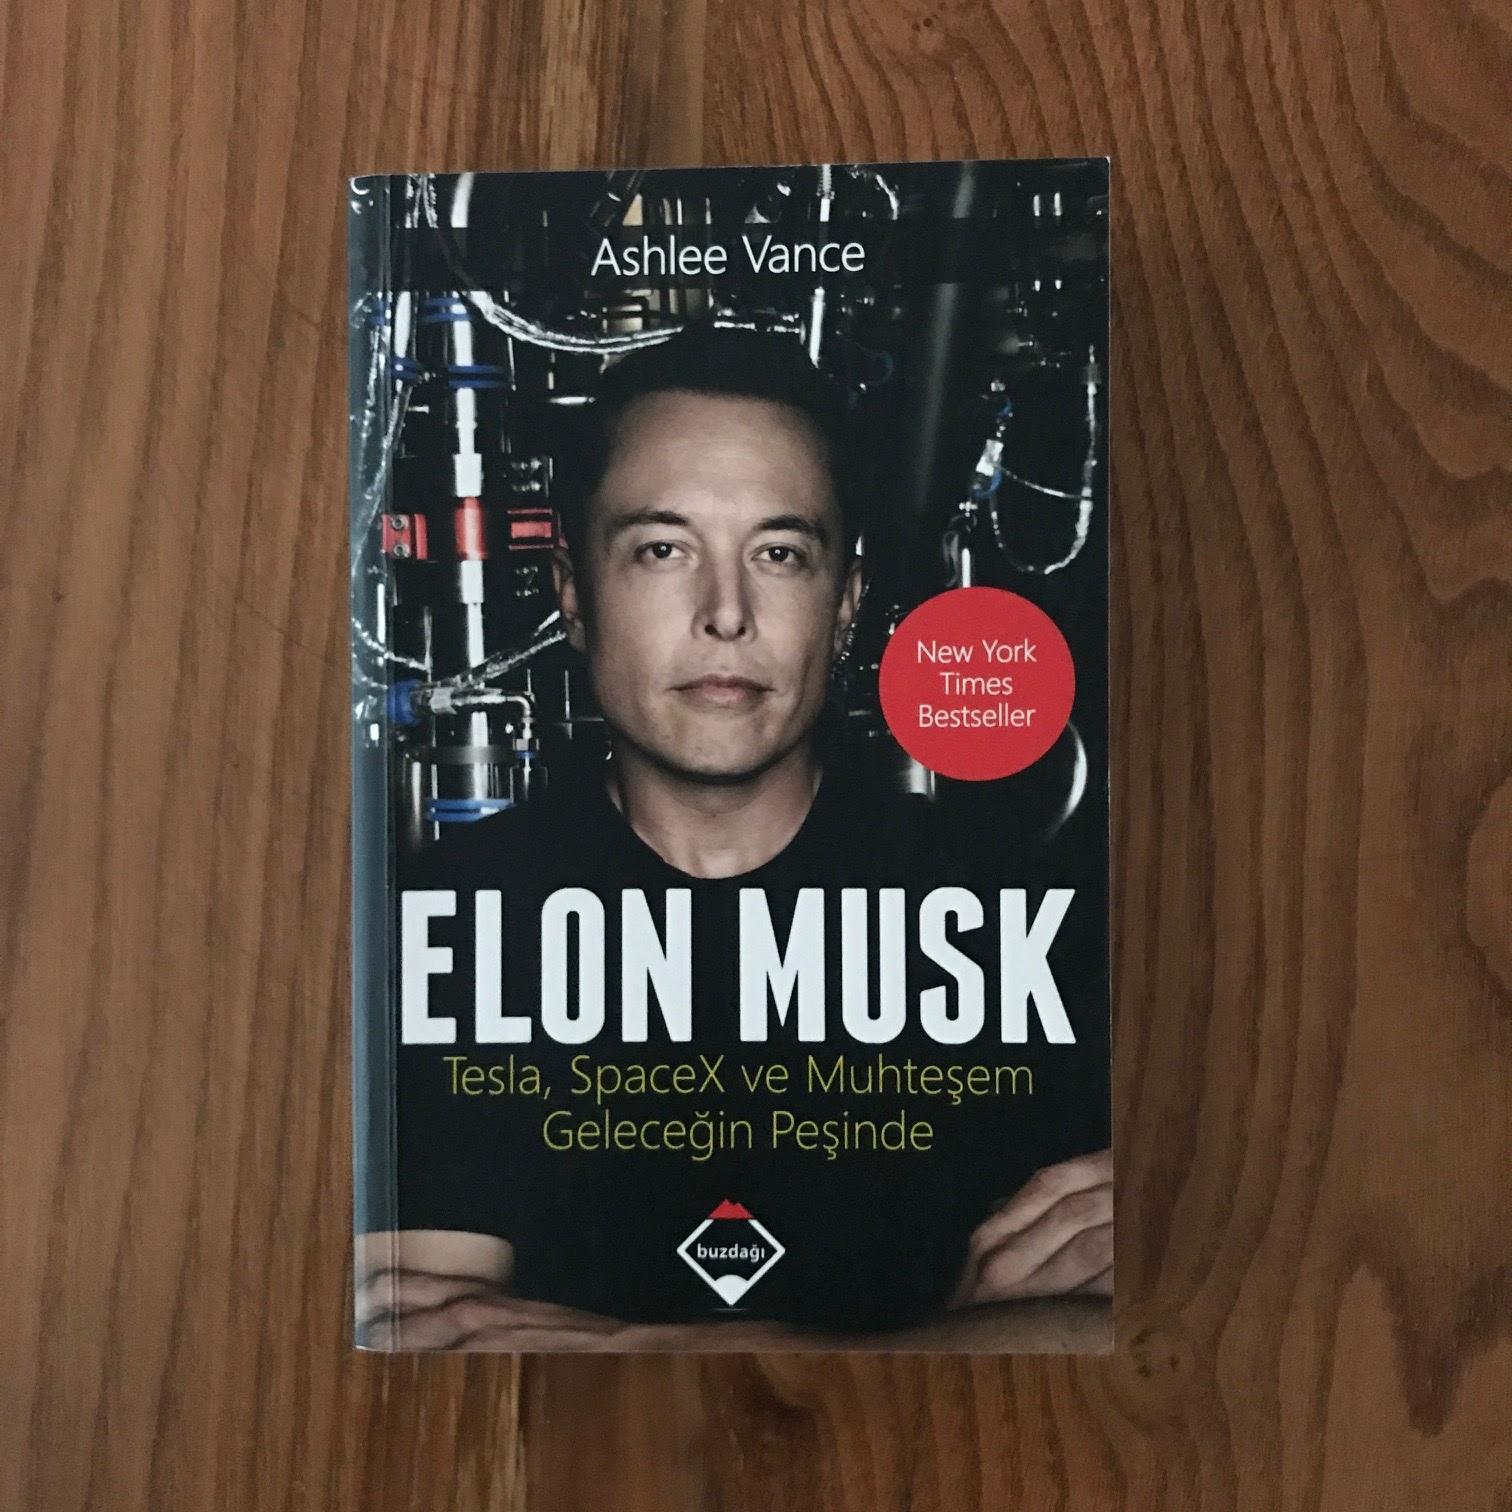 Elon Musk - Tesla, SpaceX ve Muhtesem Gelecegin Pesinde (Video) (Kitap)